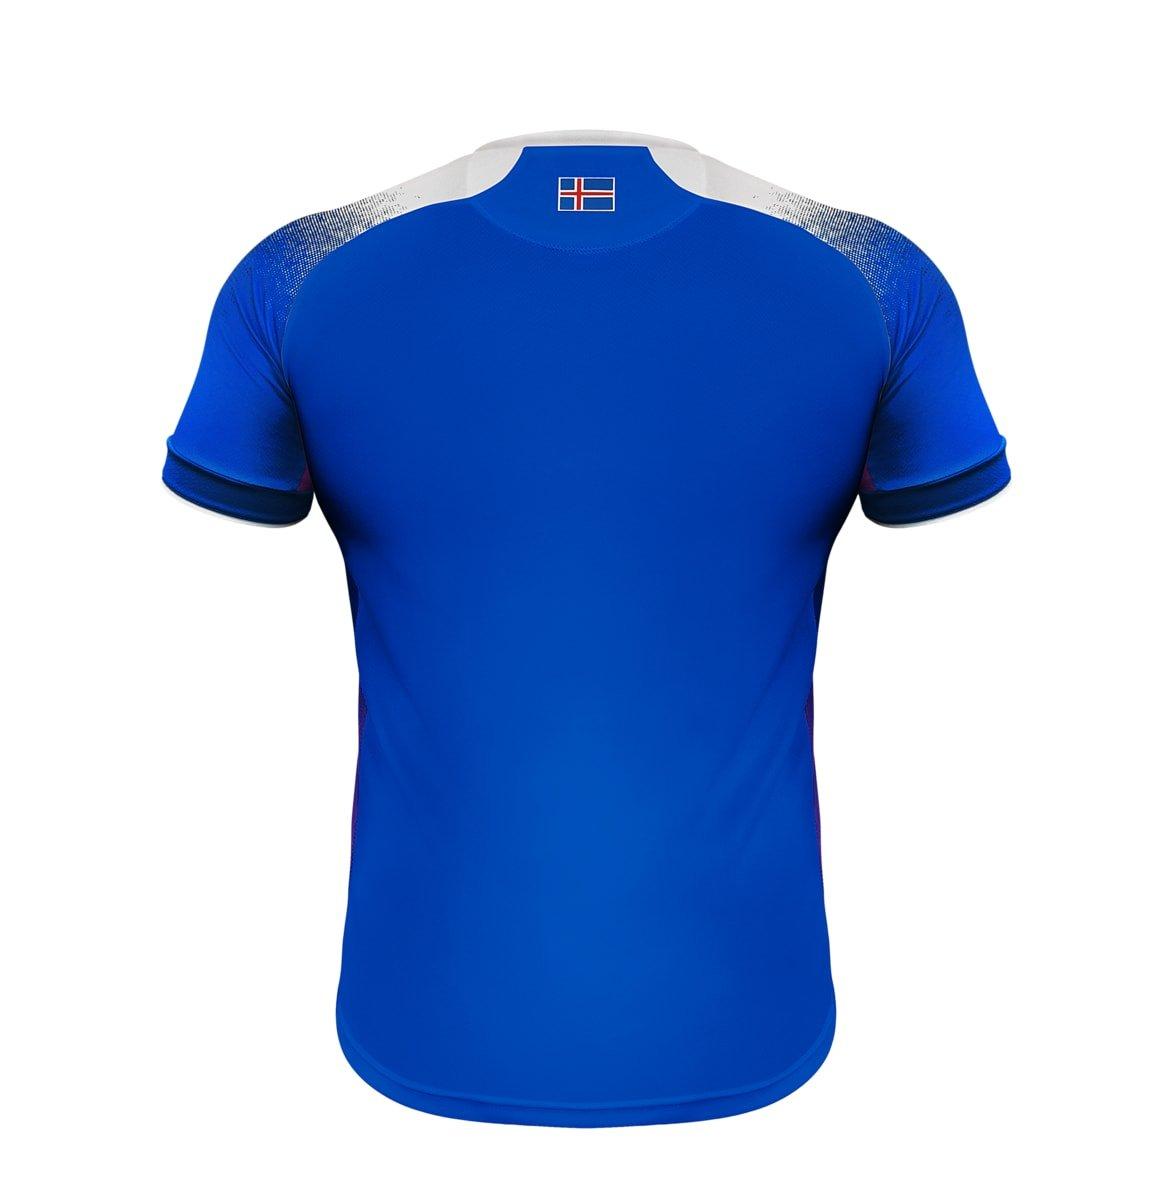 Errea Mens Iceland Home World Cup 2018 Russia Football Shirt